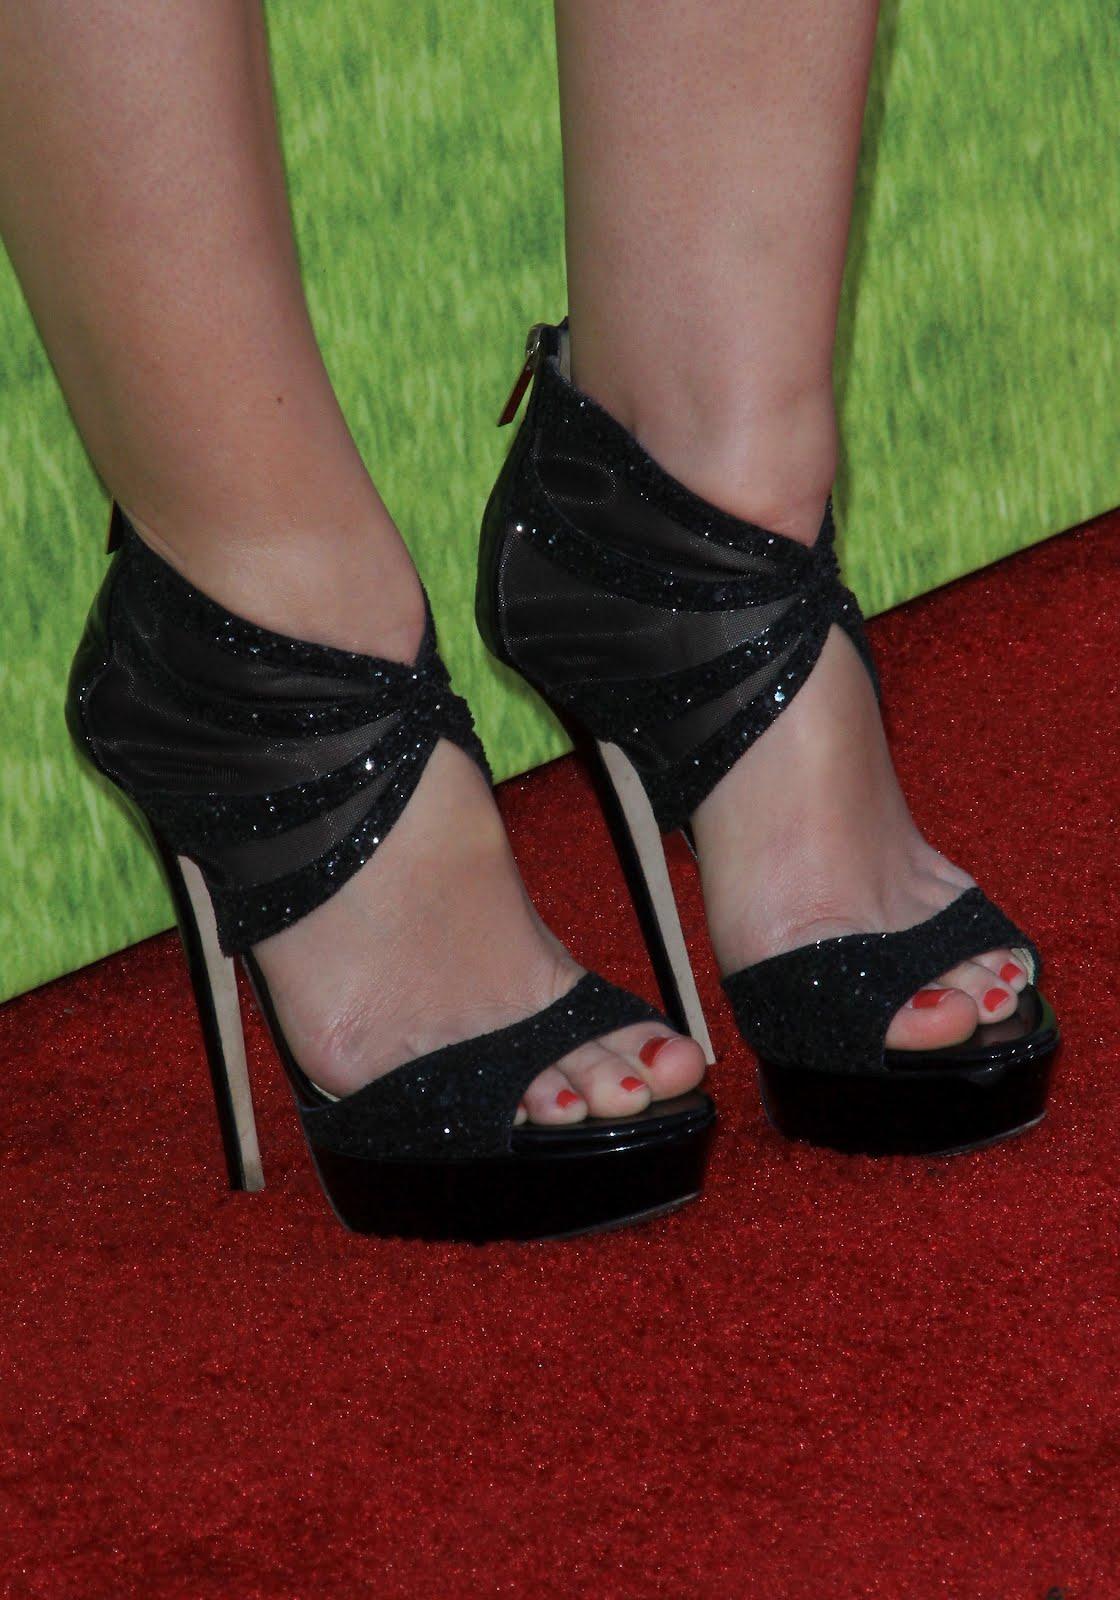 http://2.bp.blogspot.com/-cphCUxcY8-Q/UD8kde1TONI/AAAAAAAAAhk/v4D8OXDiw00/s1600/Leighton_Meester_Feet_05.jpg